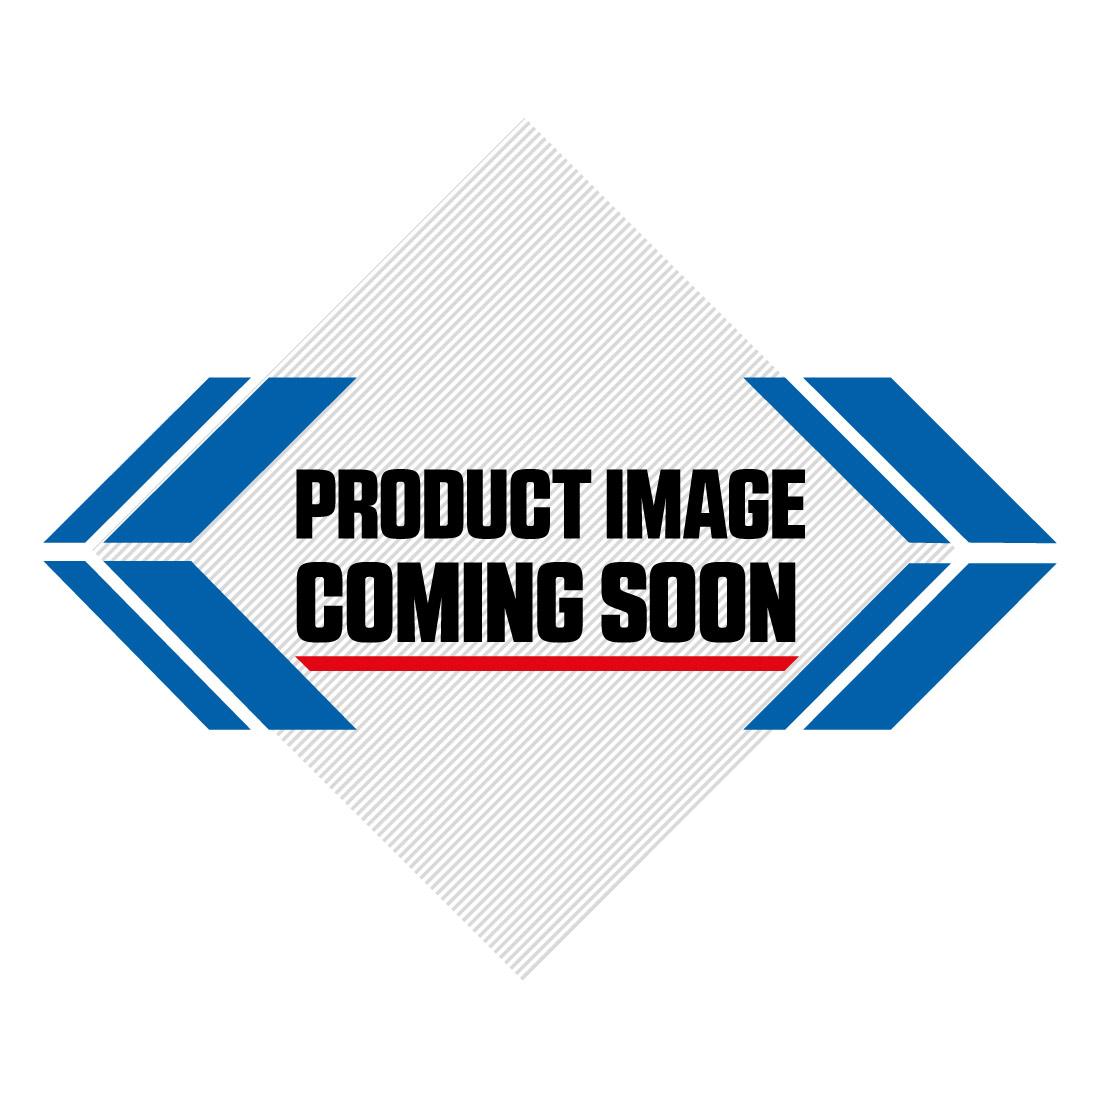 2018 Sidi Crossfire 3 SRS Cairoli Motocross Boots - Ltd Ed Yellow Flo White Image-3>